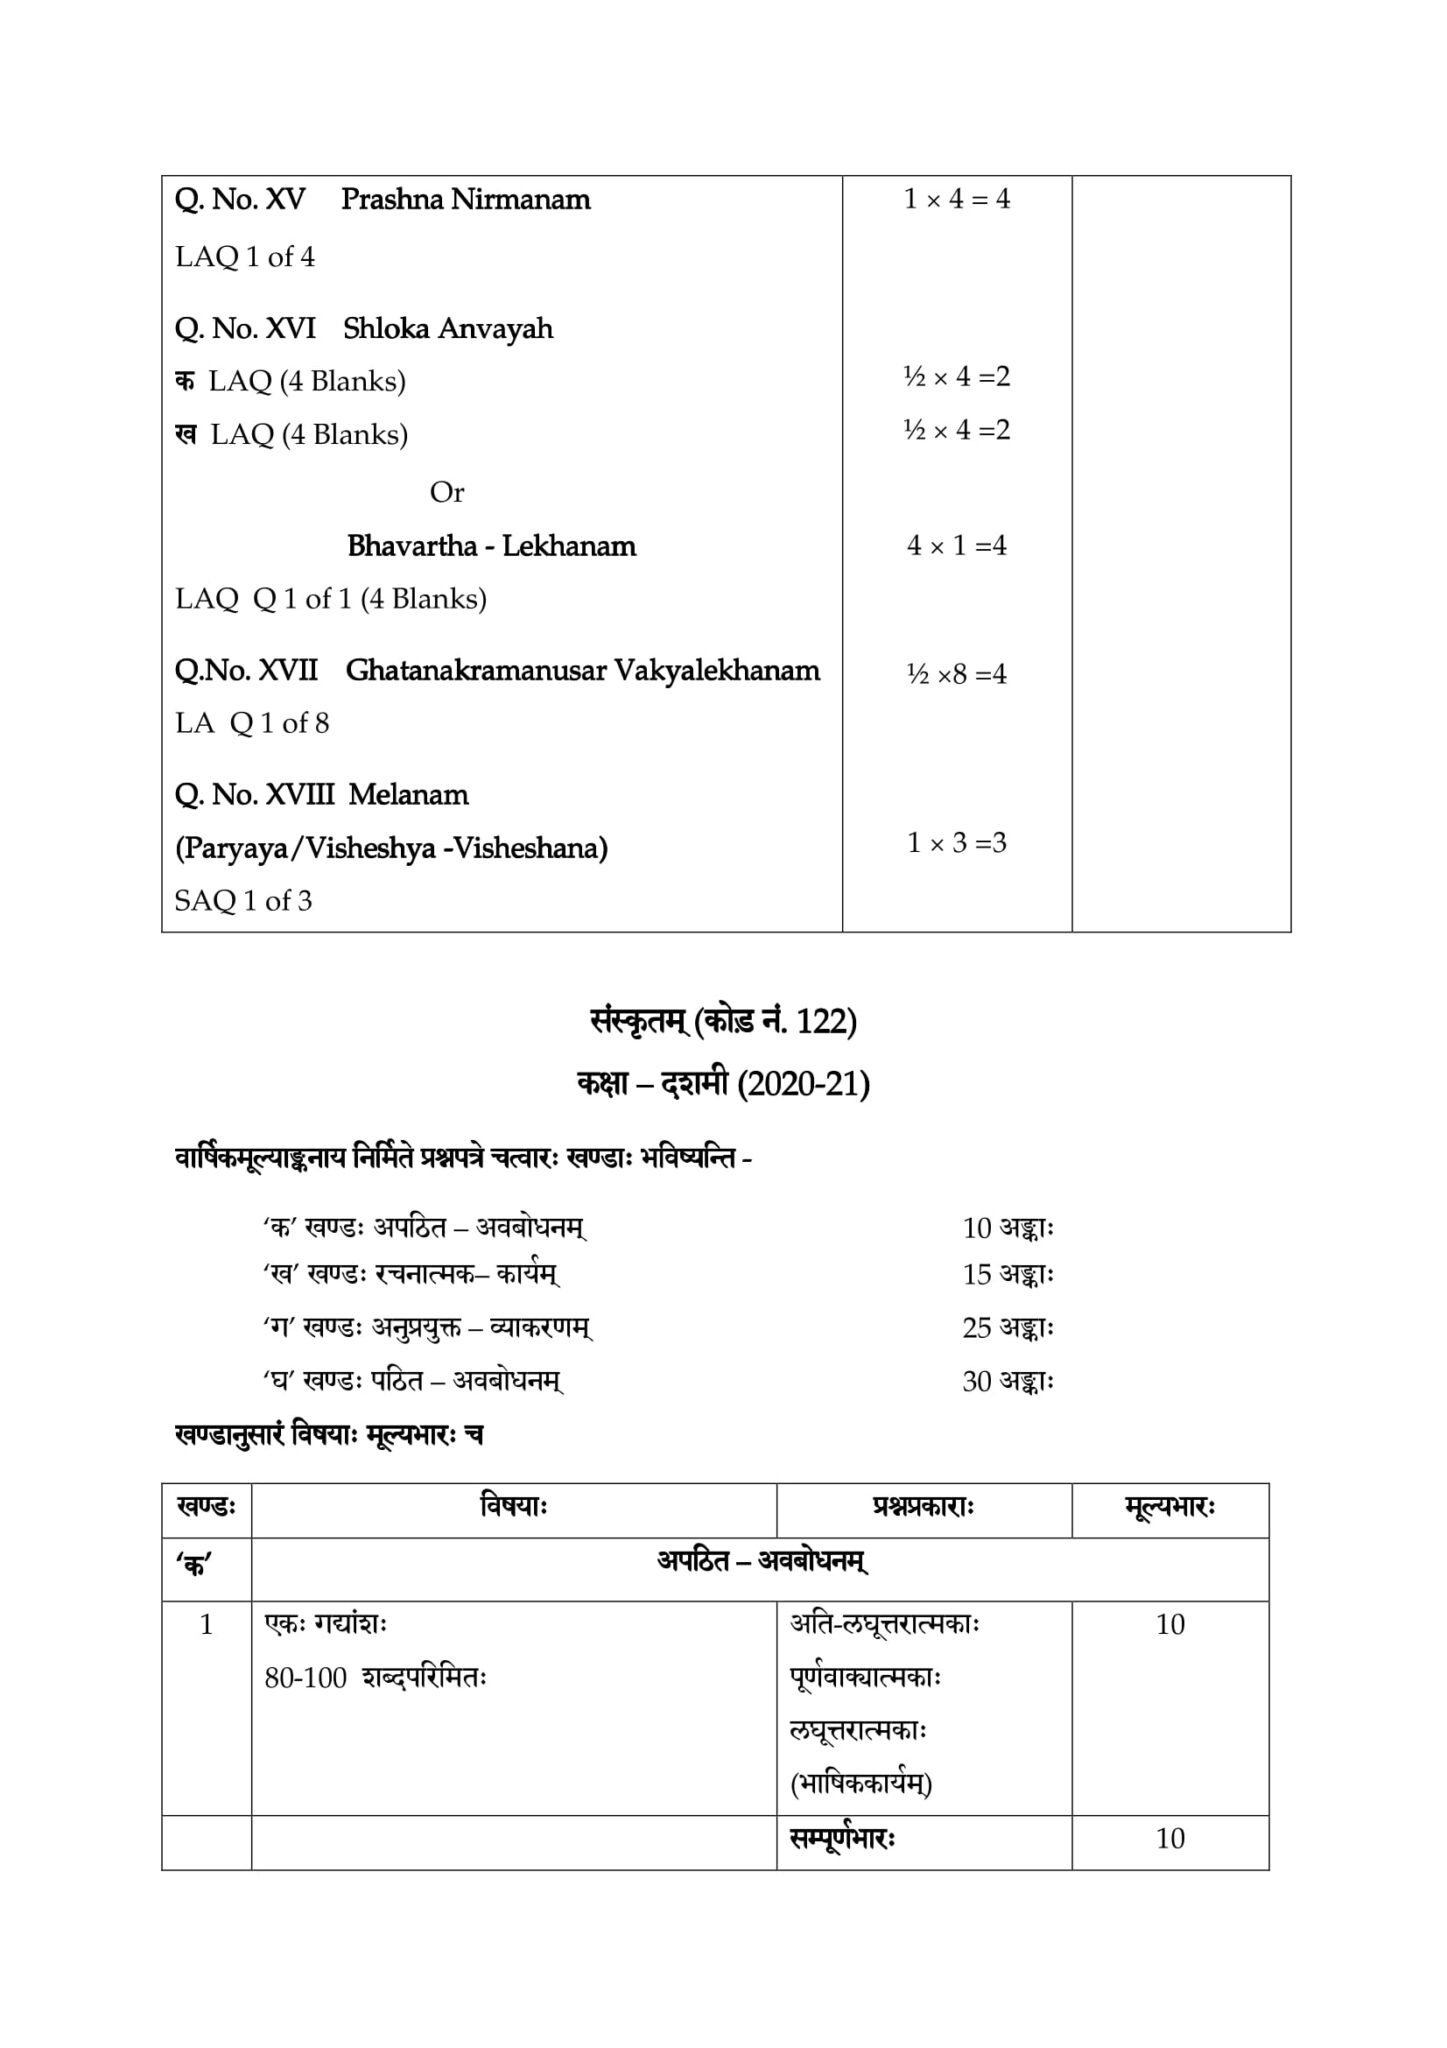 Sanskrit Sec 2020 21 class 9 10 15